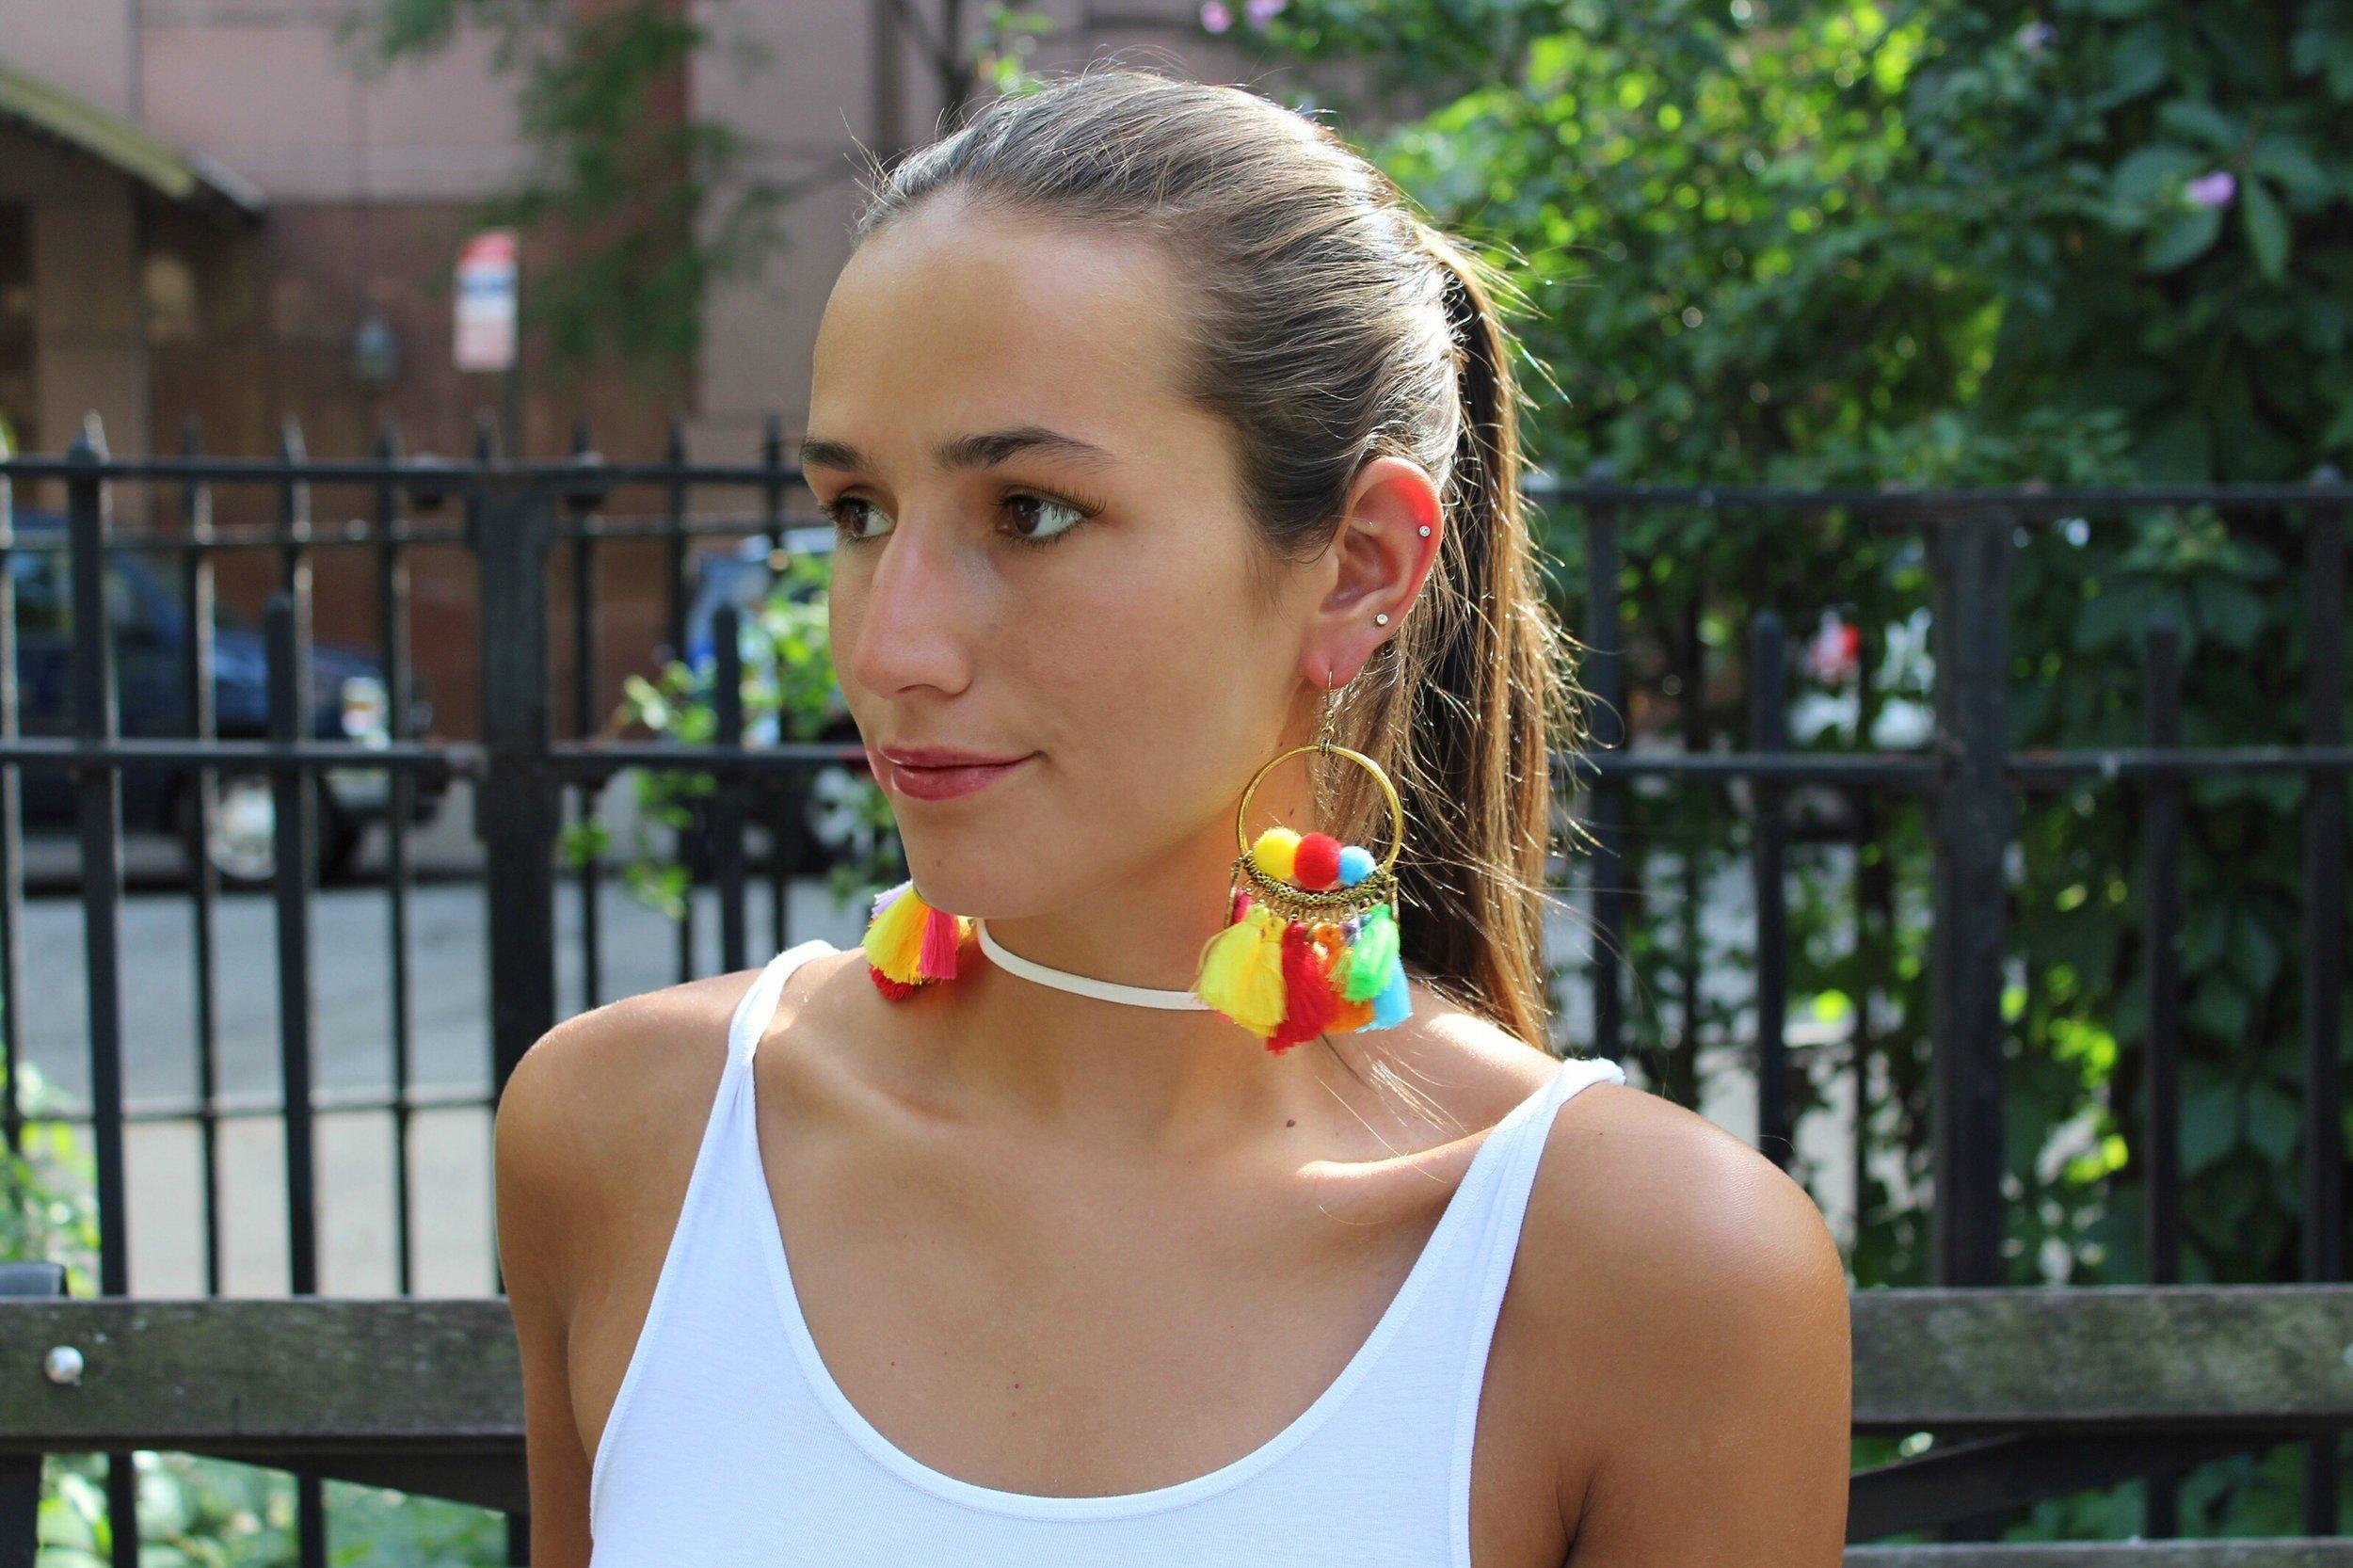 YIN 2MY YANG X ALEX MIKA JEWELRY SOPHIE BICKLEY NYC FASHION BLOGGERS